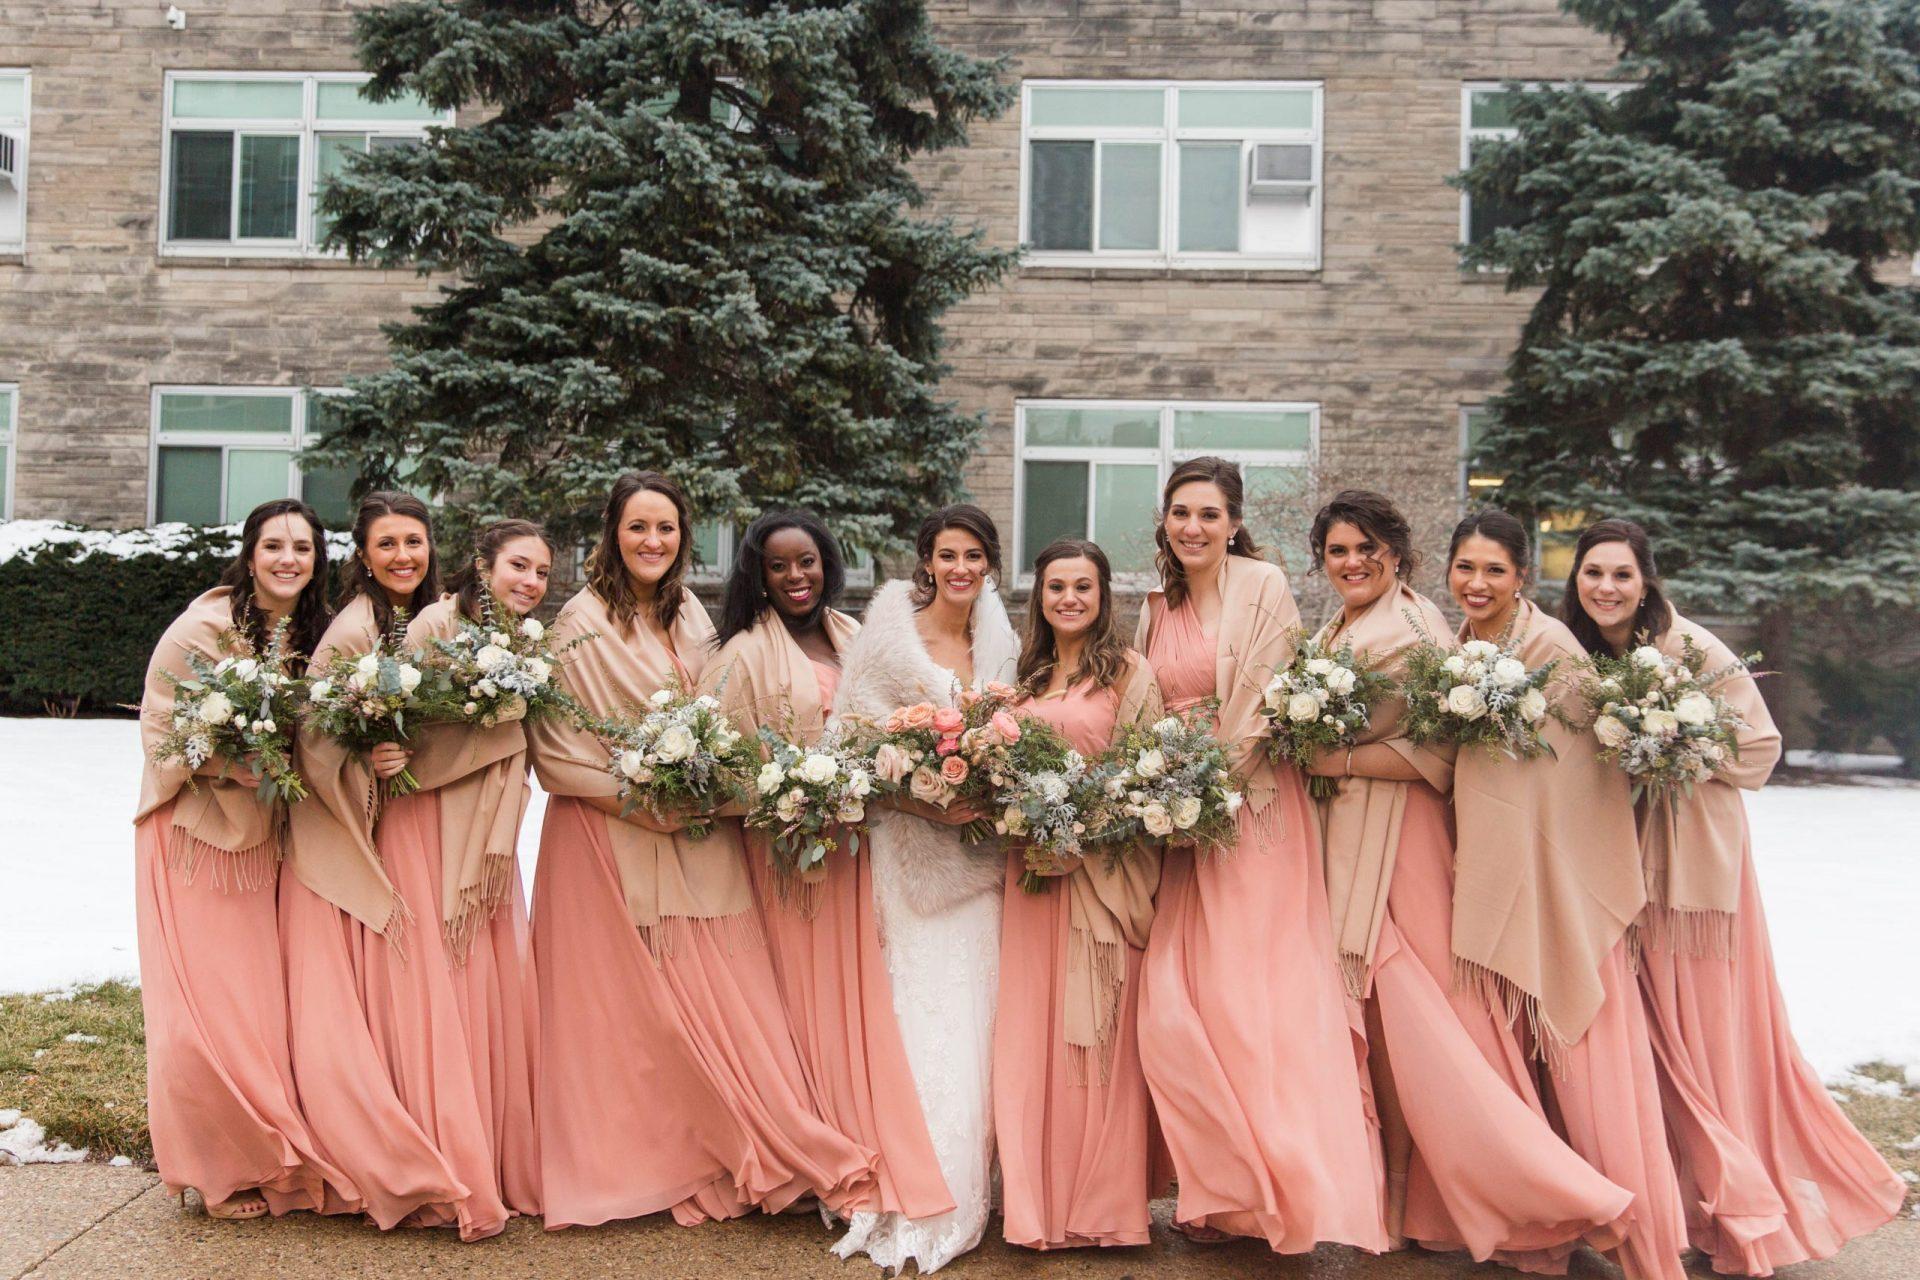 Romantic Winter Wedding Bridesmaid Bouquets Flowers Morgan Manufacturing Chicago